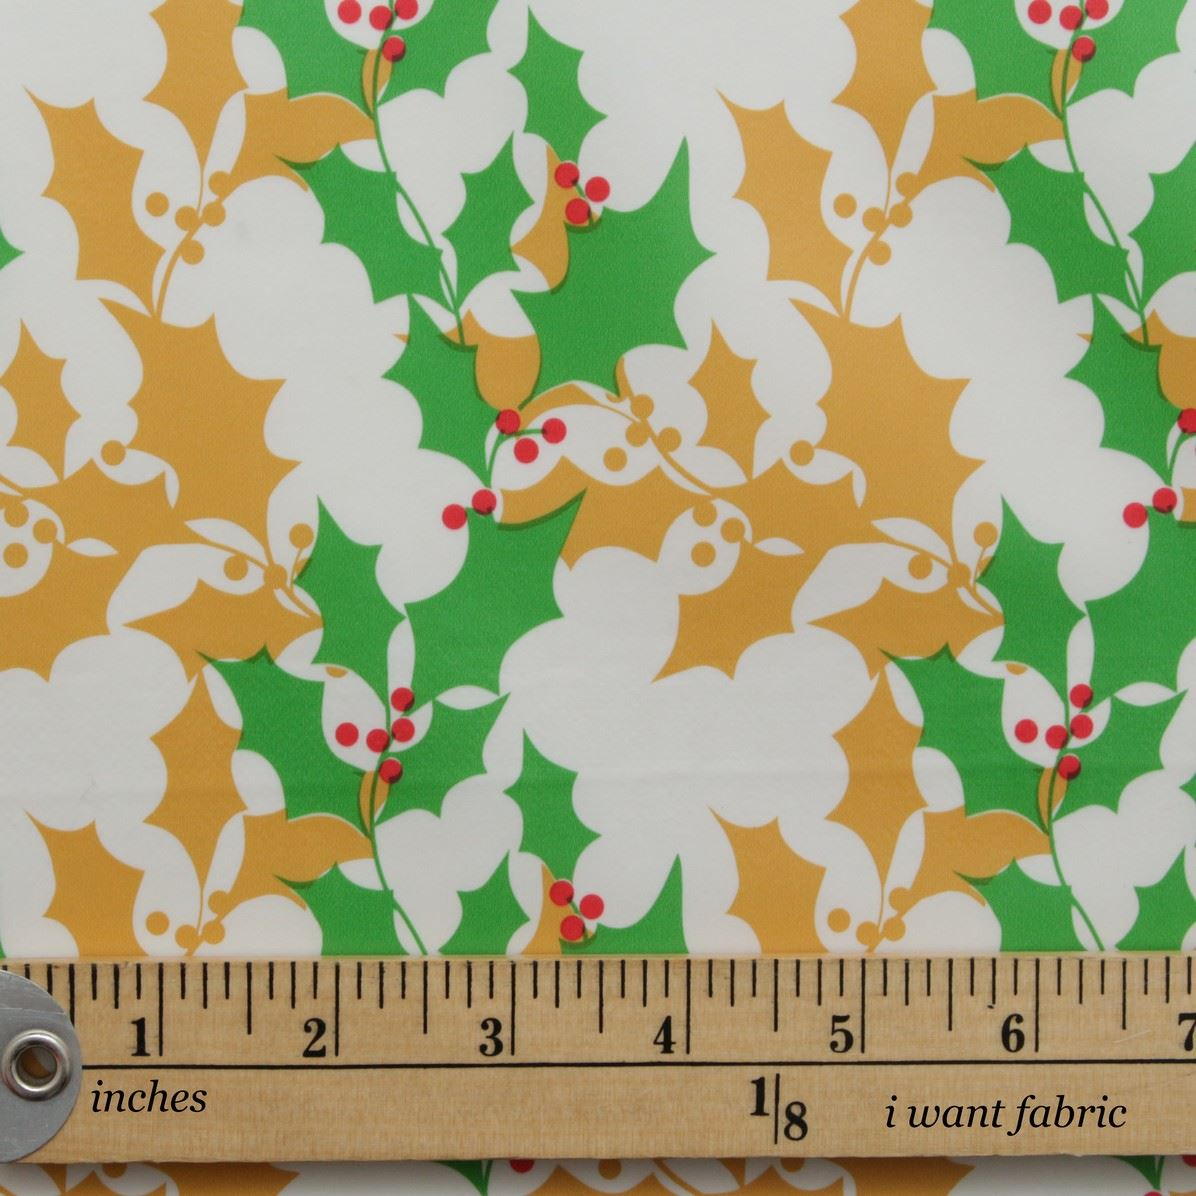 thumbnail 14 - CHRISTMAS PVC OILCLOTH VINYL FABRIC XMAS KITCHEN TABLE WIPECLEAN TABLECLOTHS